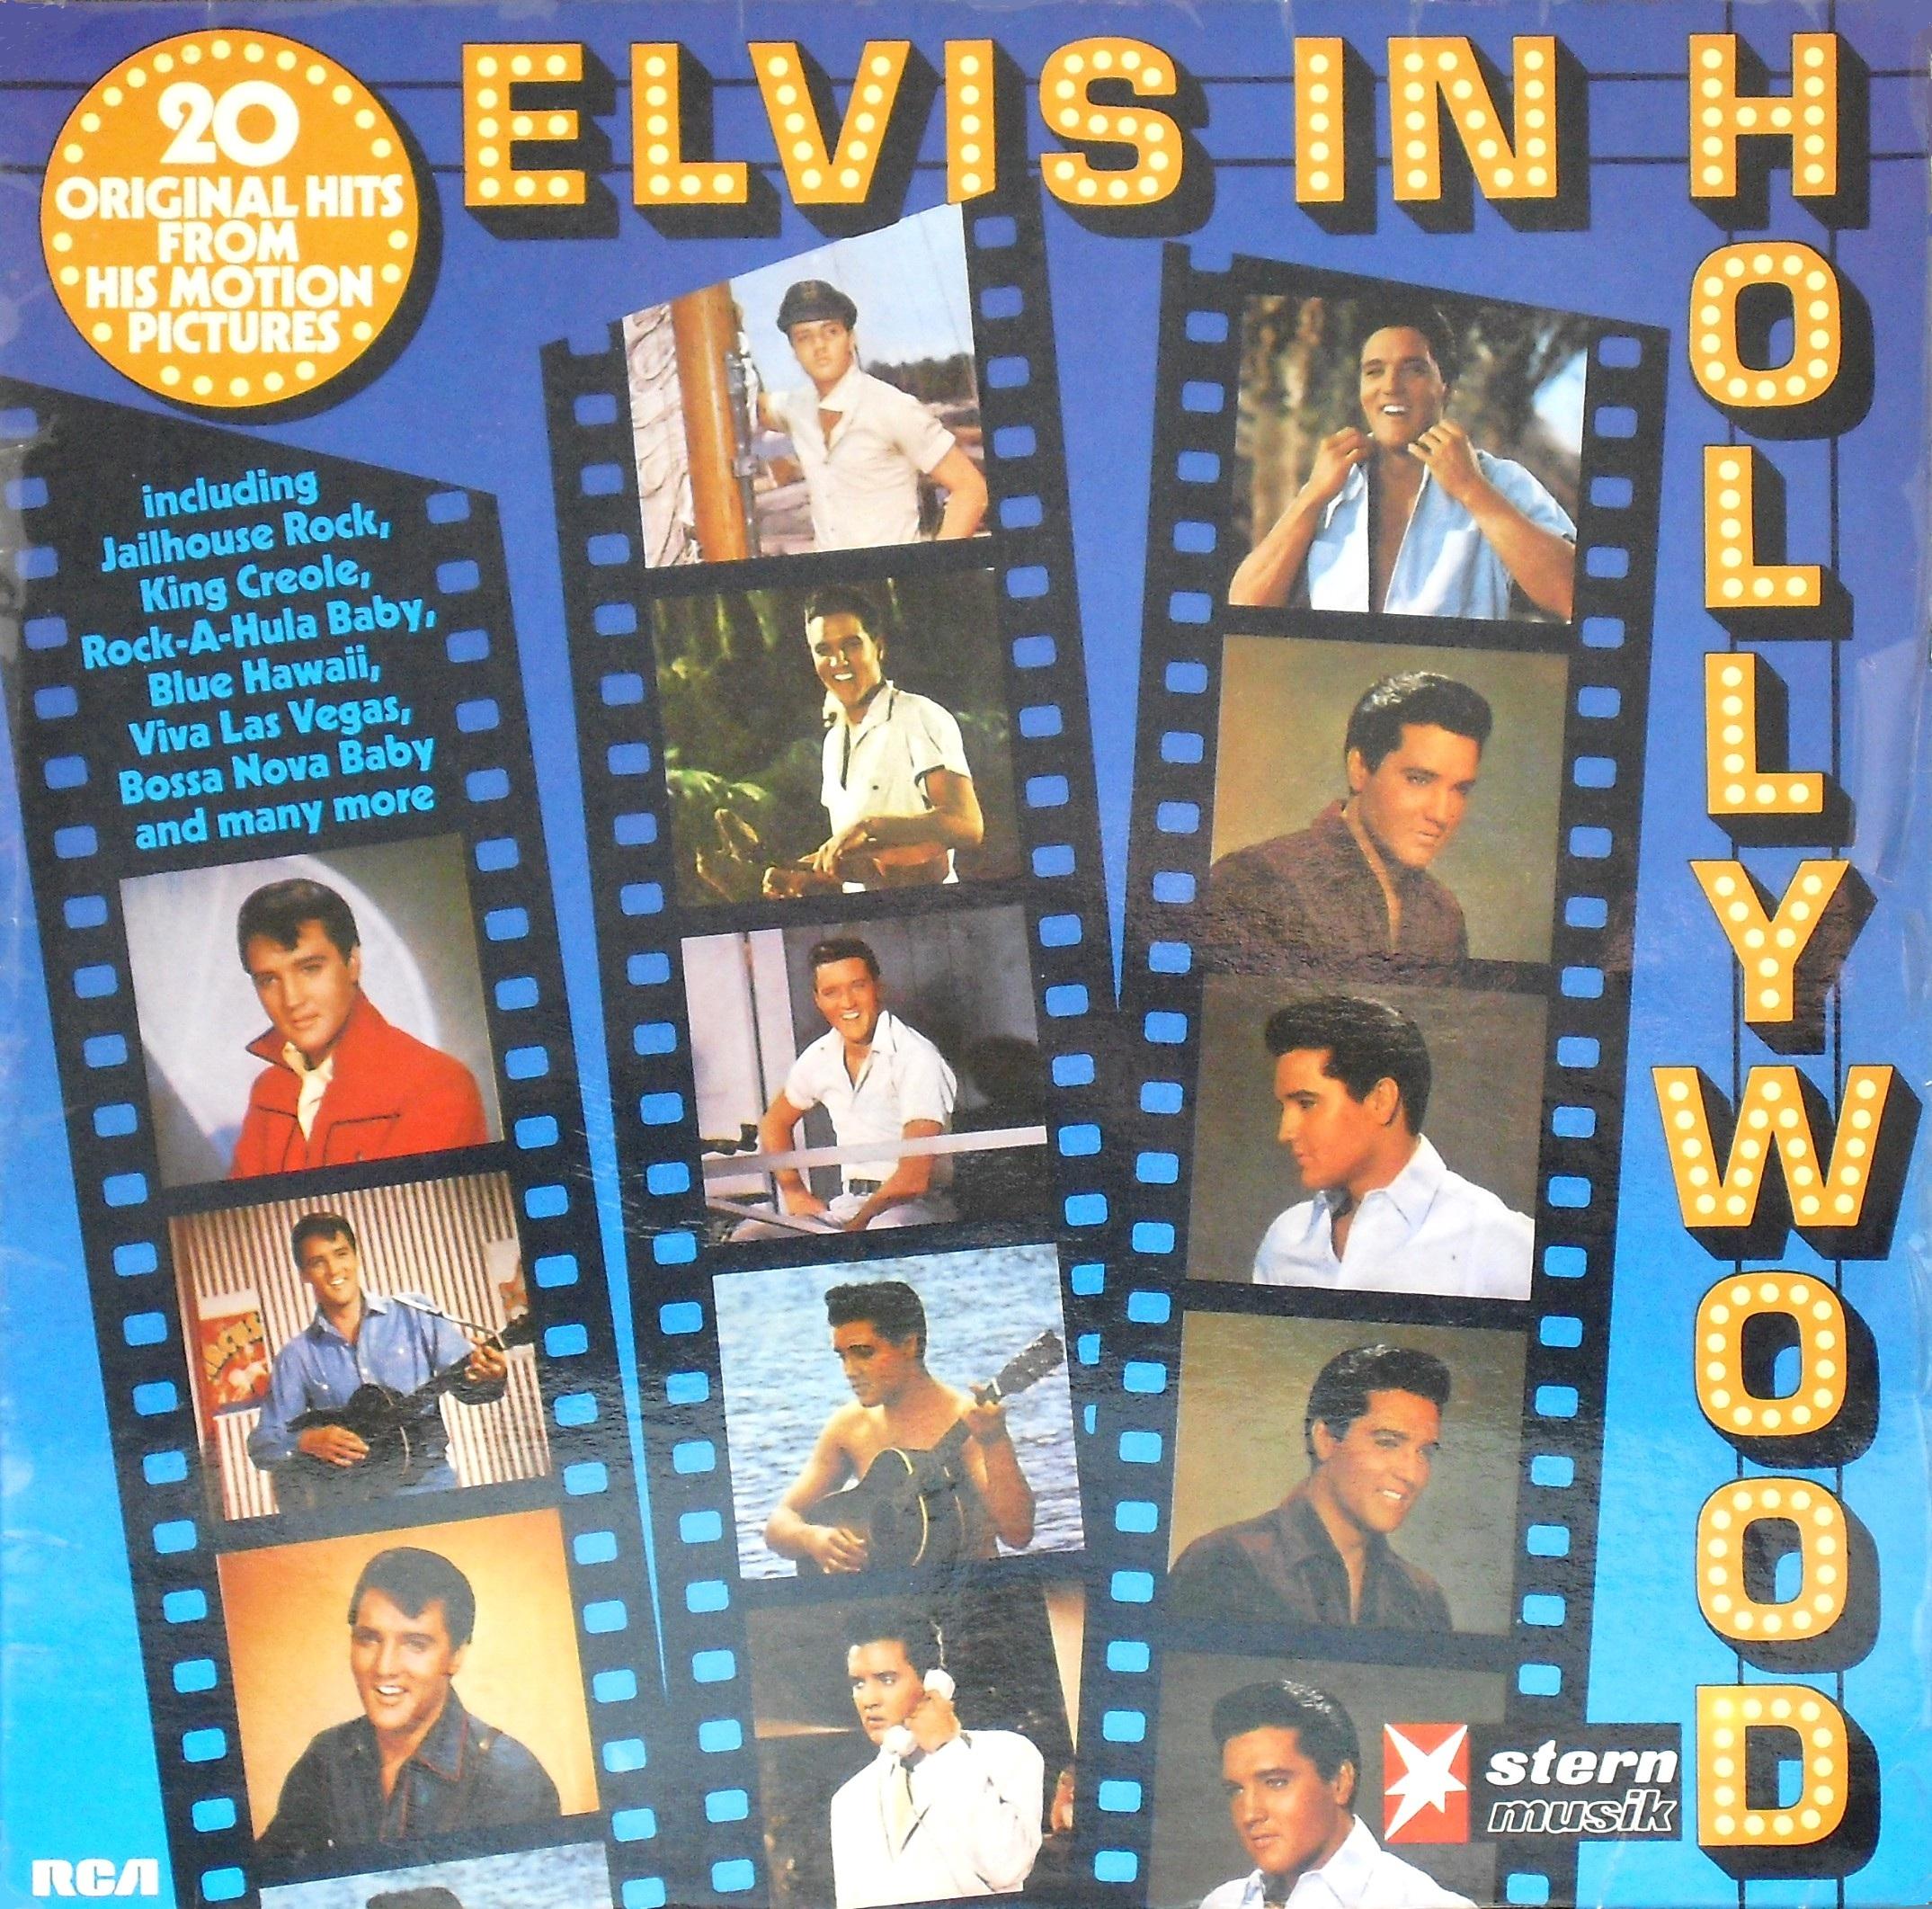 ELVIS IN HOLLYWOOD 01y1uc0